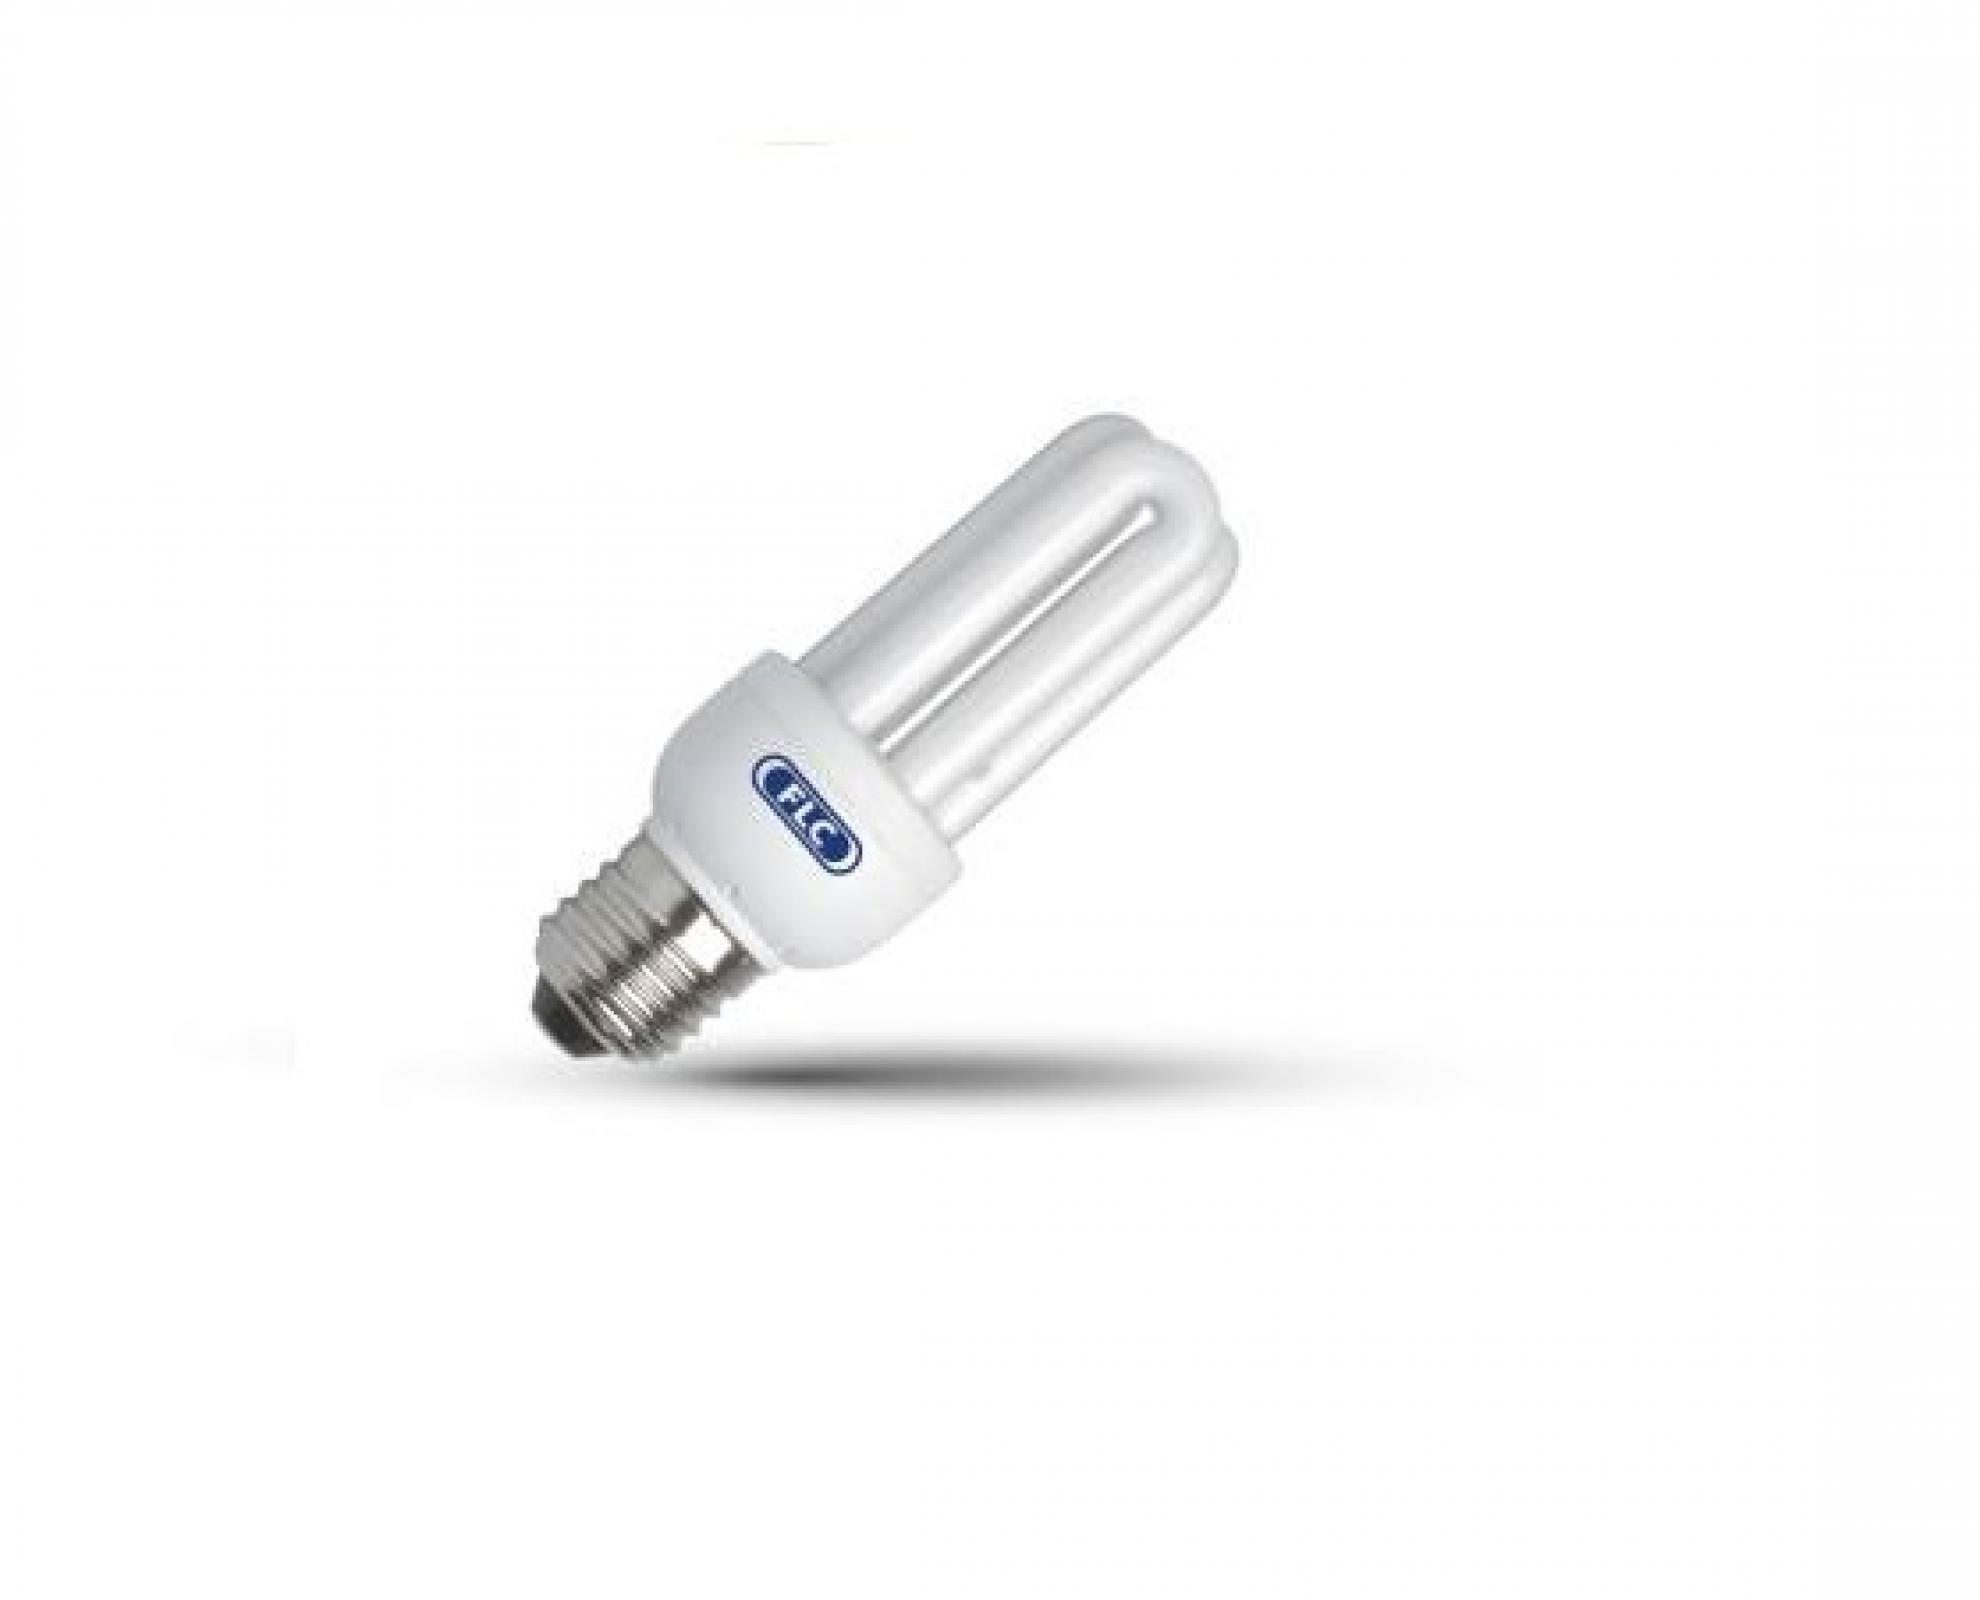 Lampada eletronica 15W 220V - 3U Mini